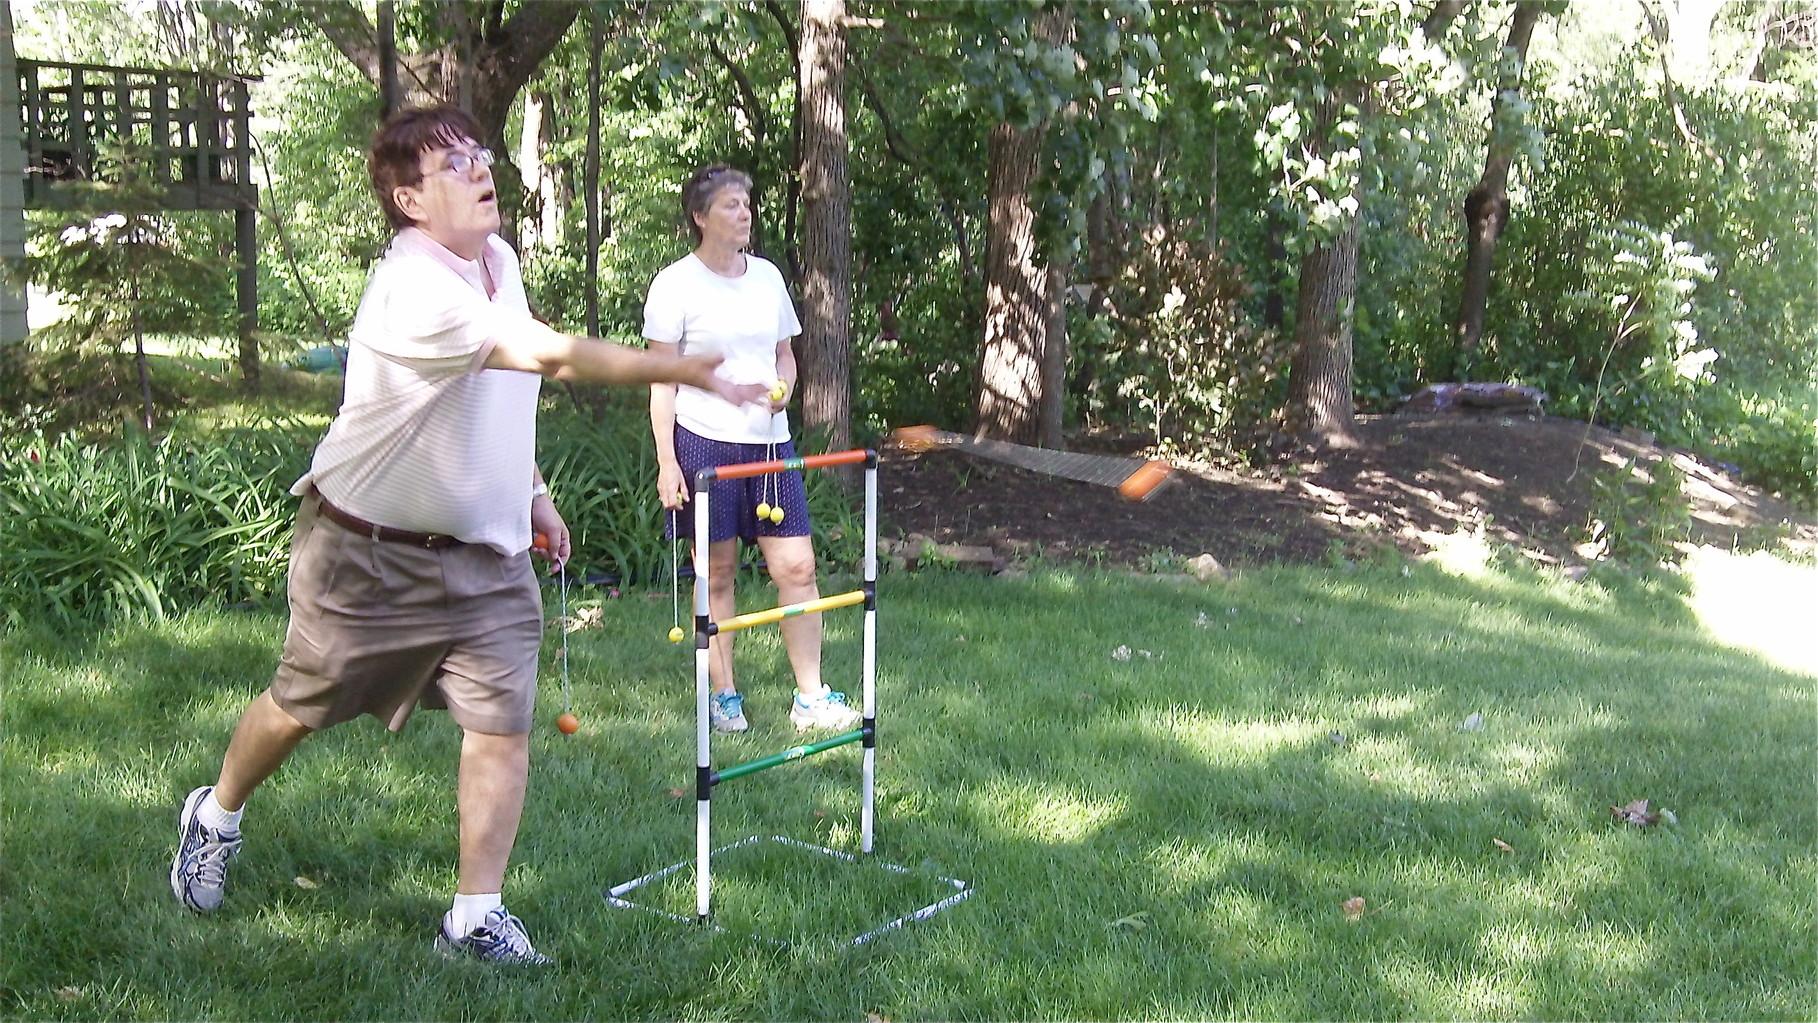 John Wagner throws-bocchi like game. Very strange..and hard!